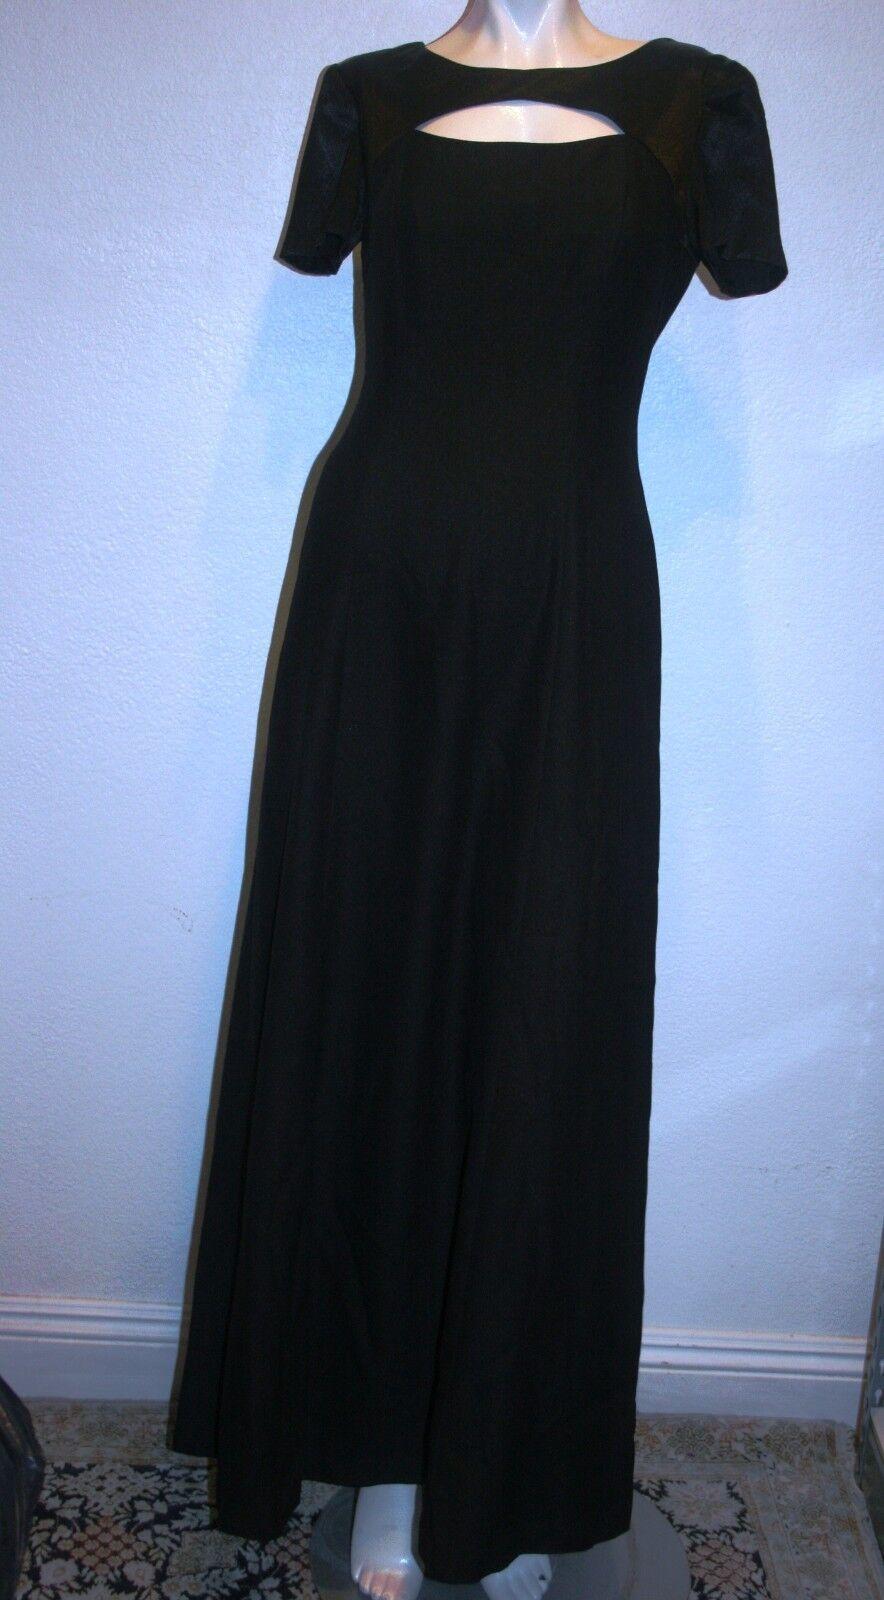 Papell Boutique Kleid Abendkleid Schwarz Kurzarm 4